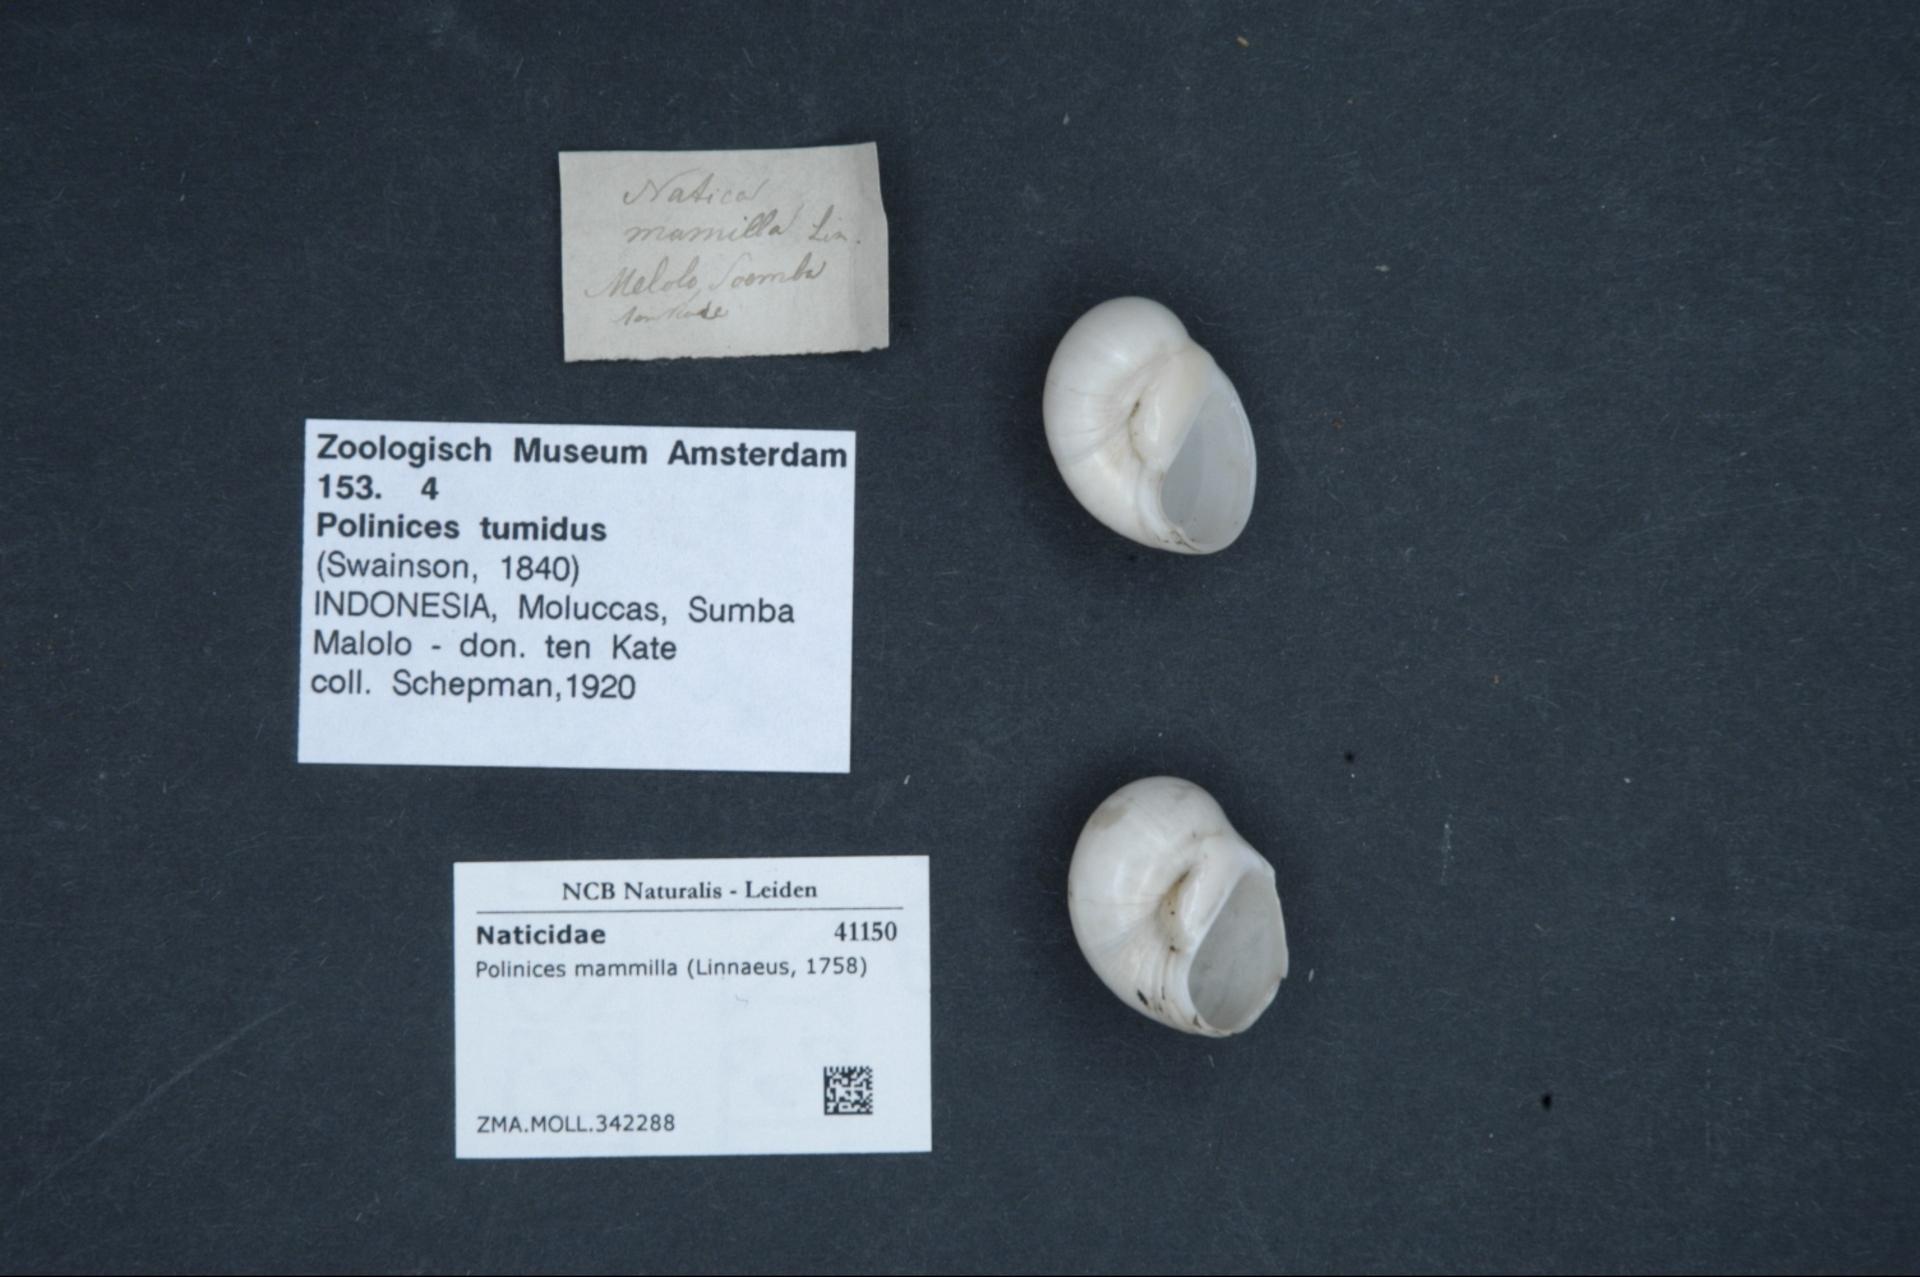 ZMA.MOLL.342288 | Polinices mammilla (Linnaeus, 1758)